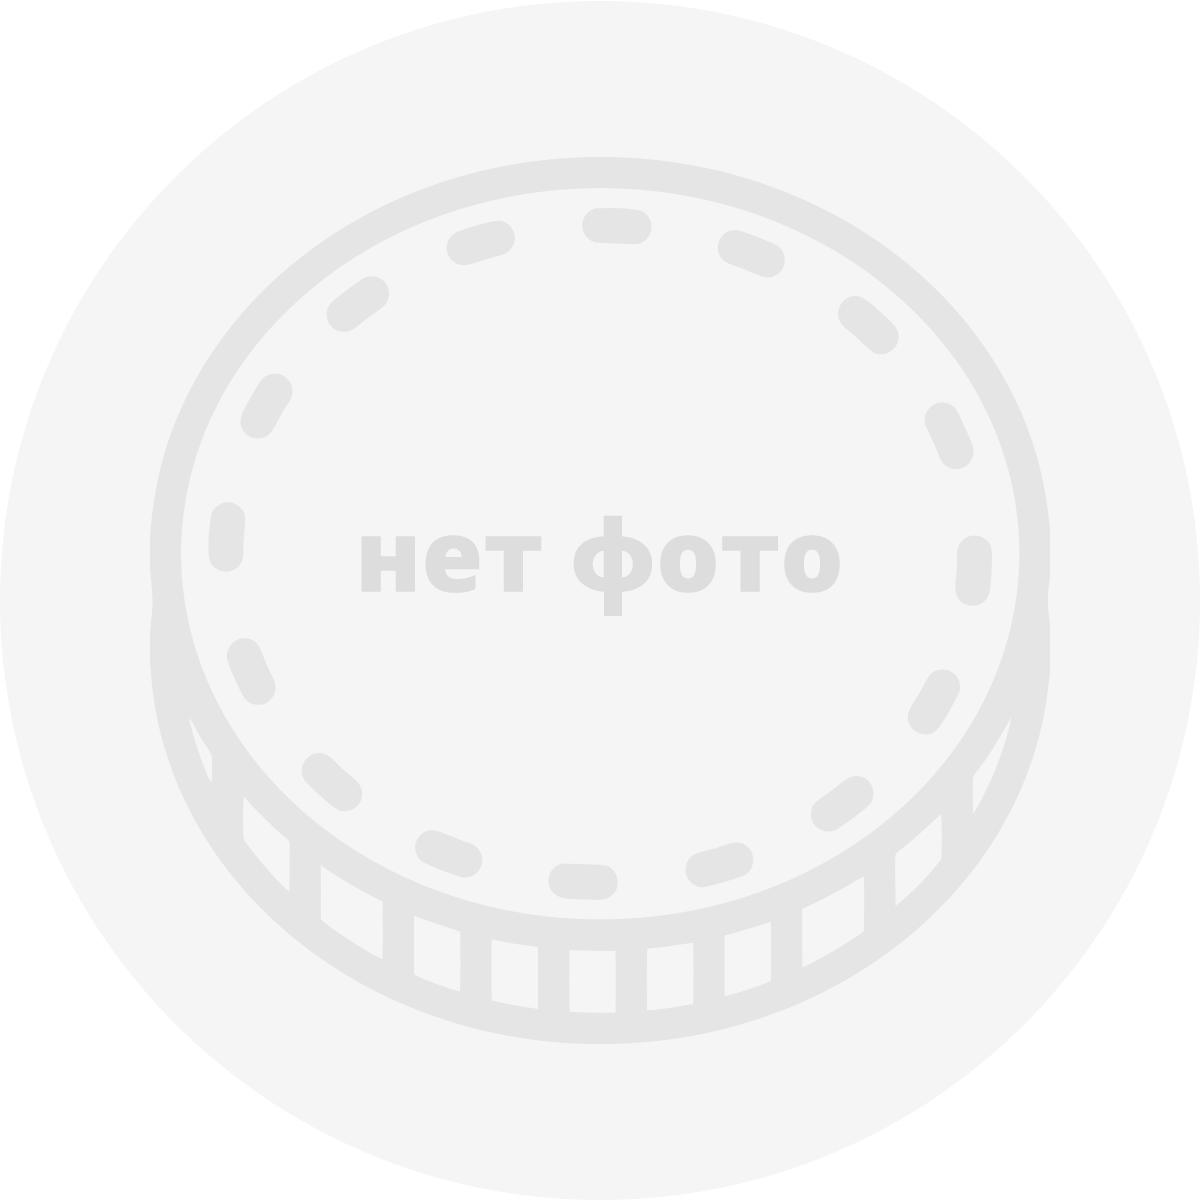 Найдена монета редкой царской чеканки